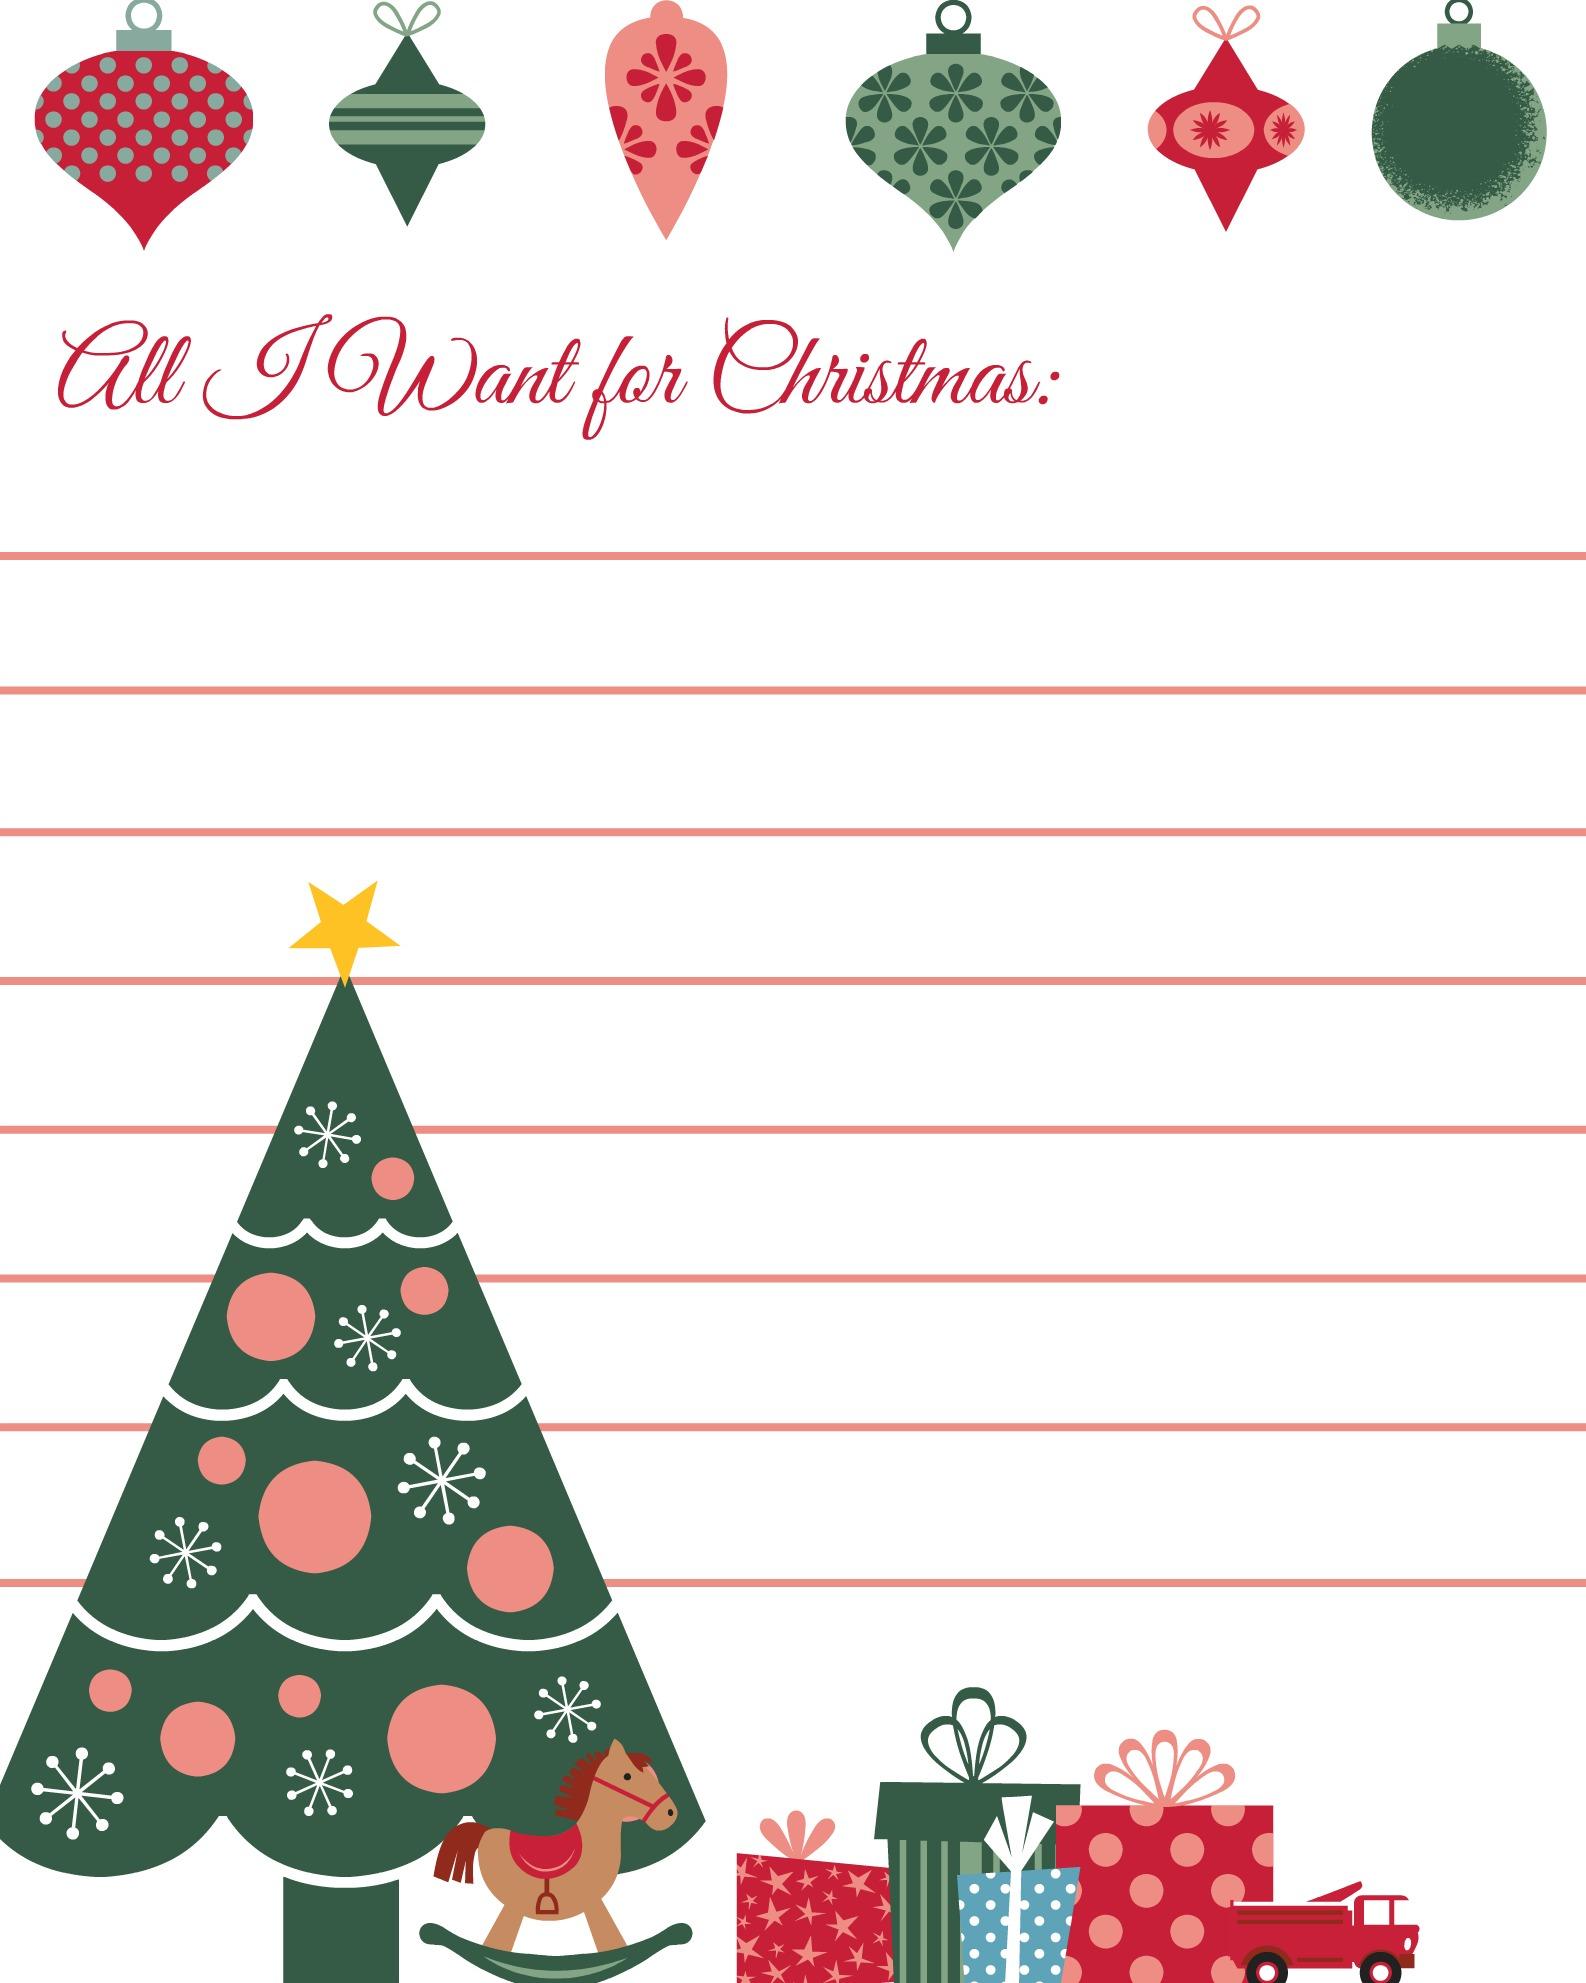 All I Want for Christmas Wish Lists Printables